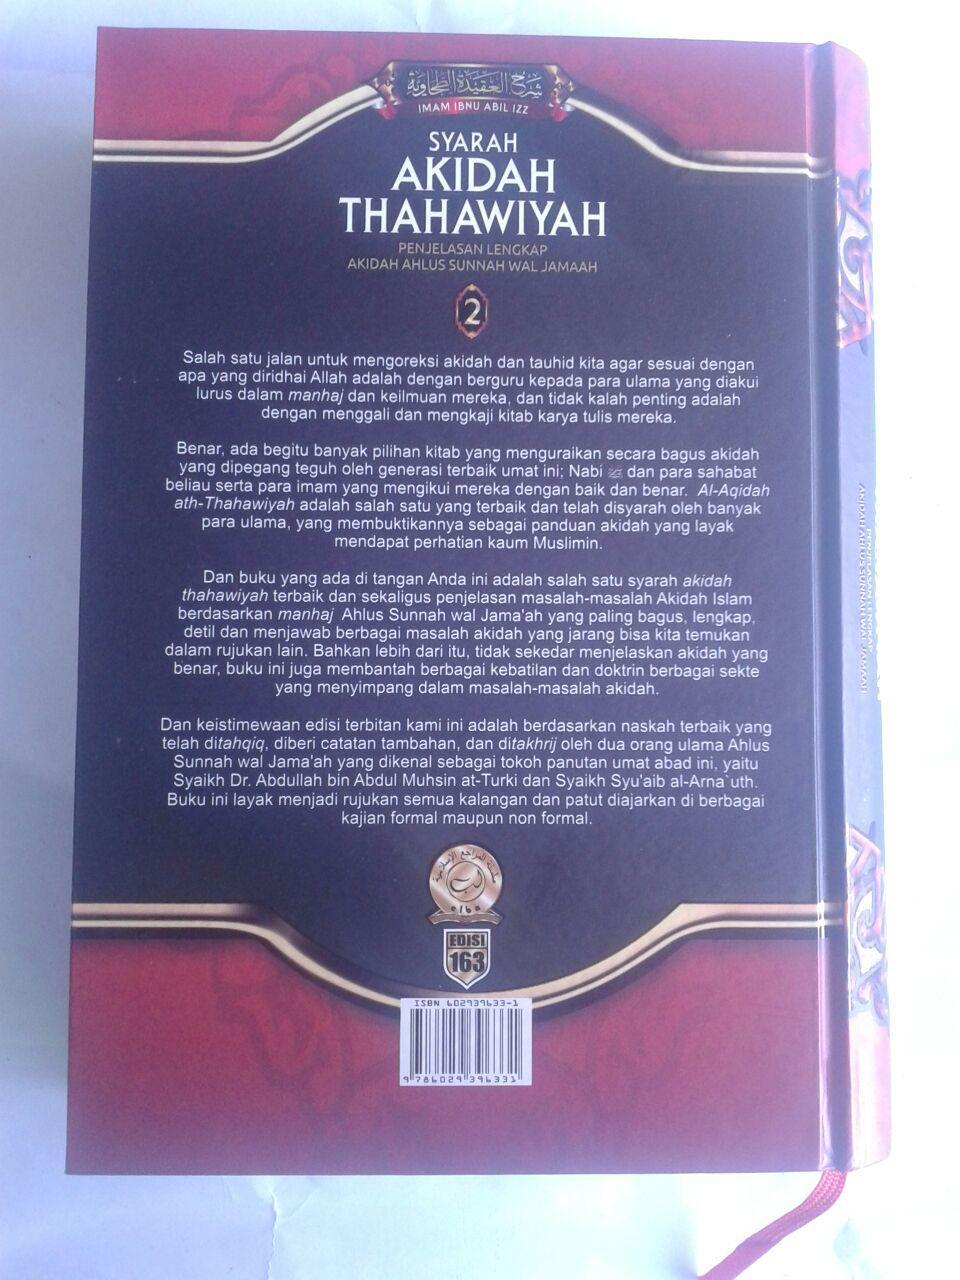 Buku Syarah Akidah Thahawiyah Akidah Ahlussunnah cover 2